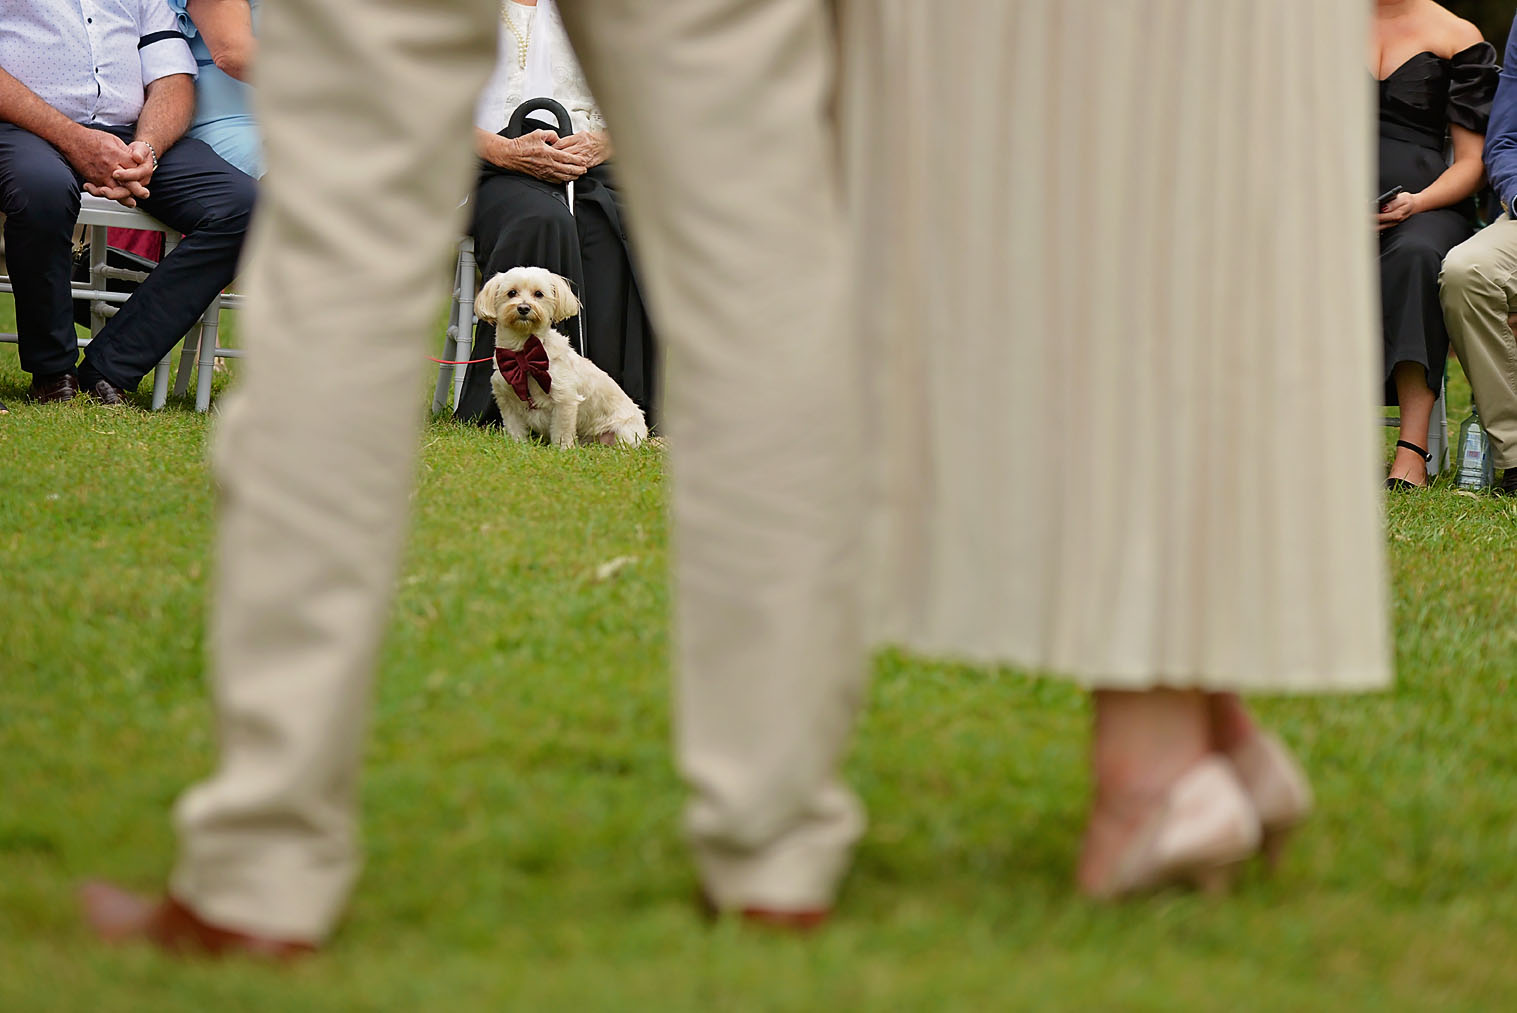 elopement brisbane elope micro wedding pop up wedding dog wedding furbaby at wedding